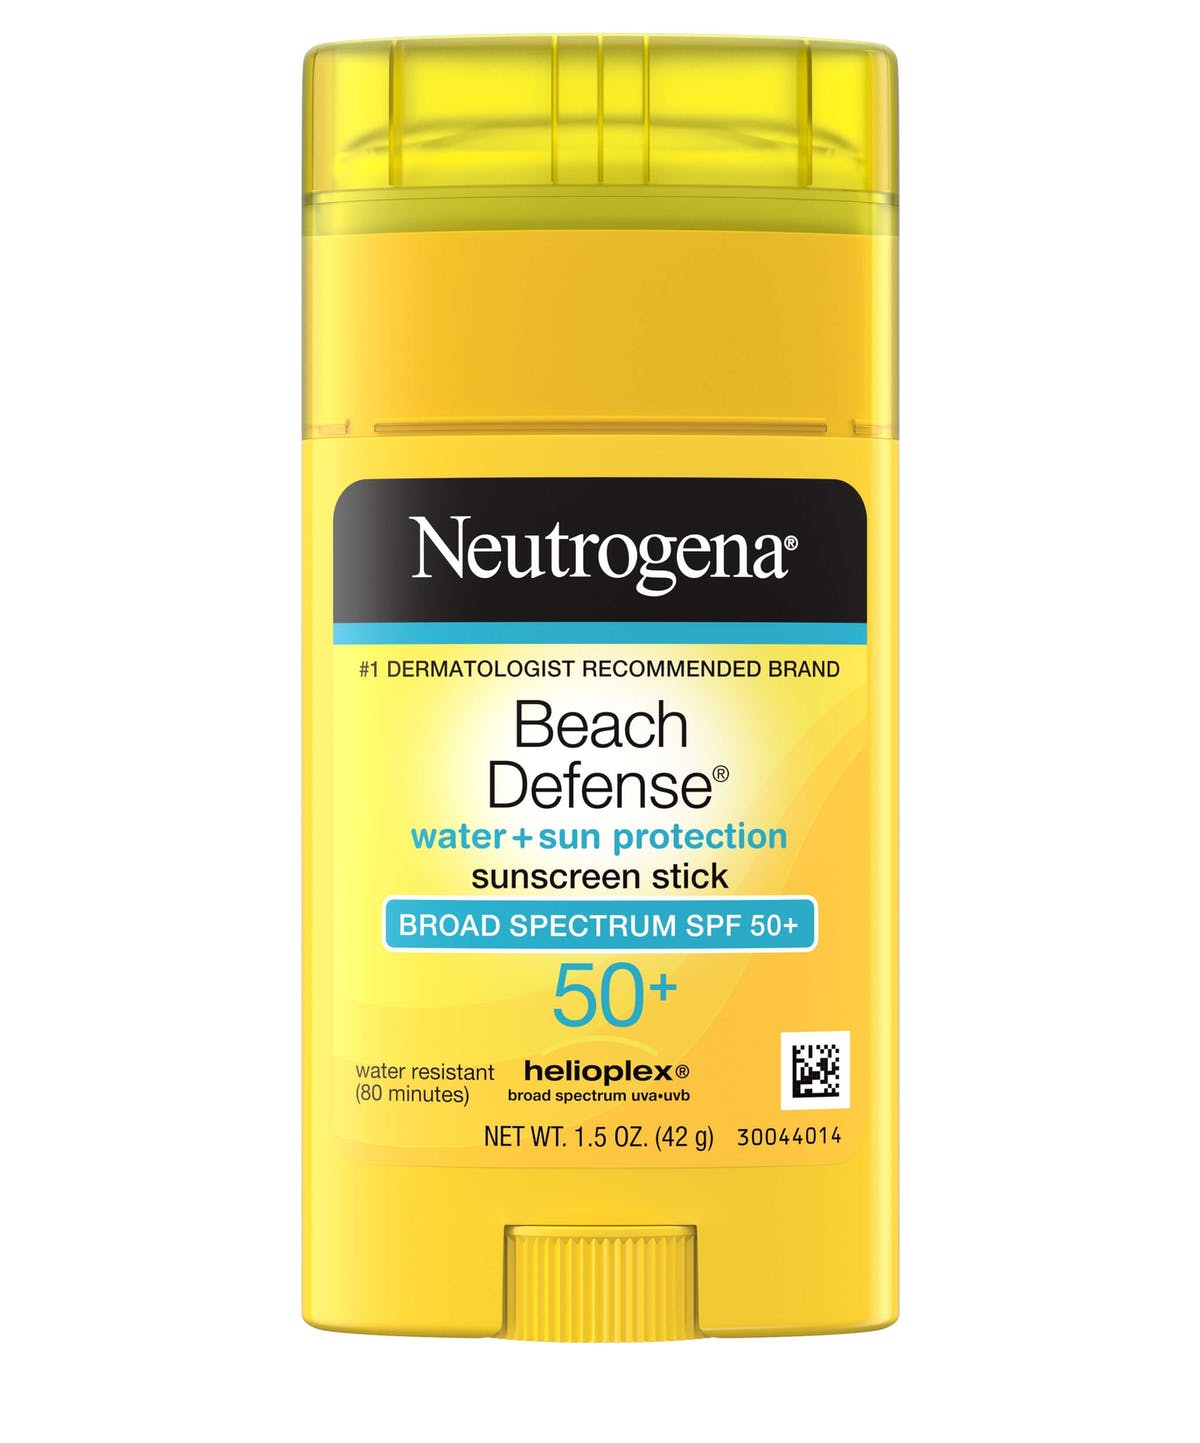 Beach Defense® Oxybenzone-Free Sunscreen Stick SPF 50 | NEUTROGENA®